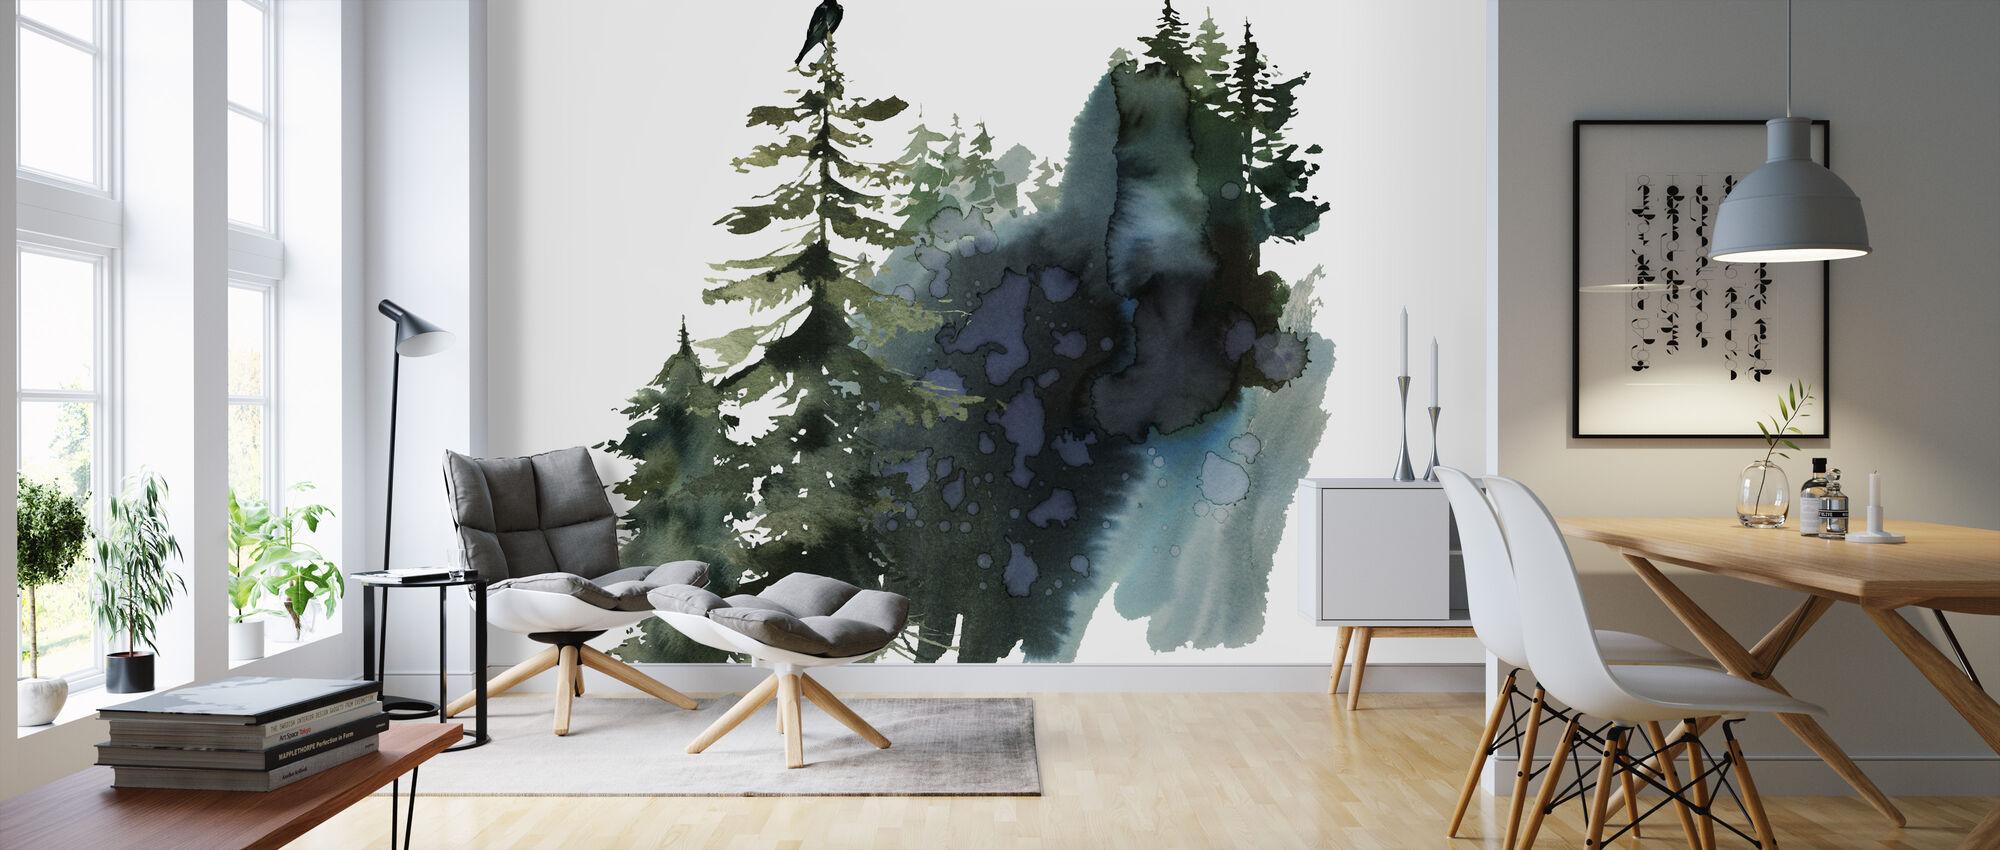 Akvarell kråka skog - Tapet - Vardagsrum